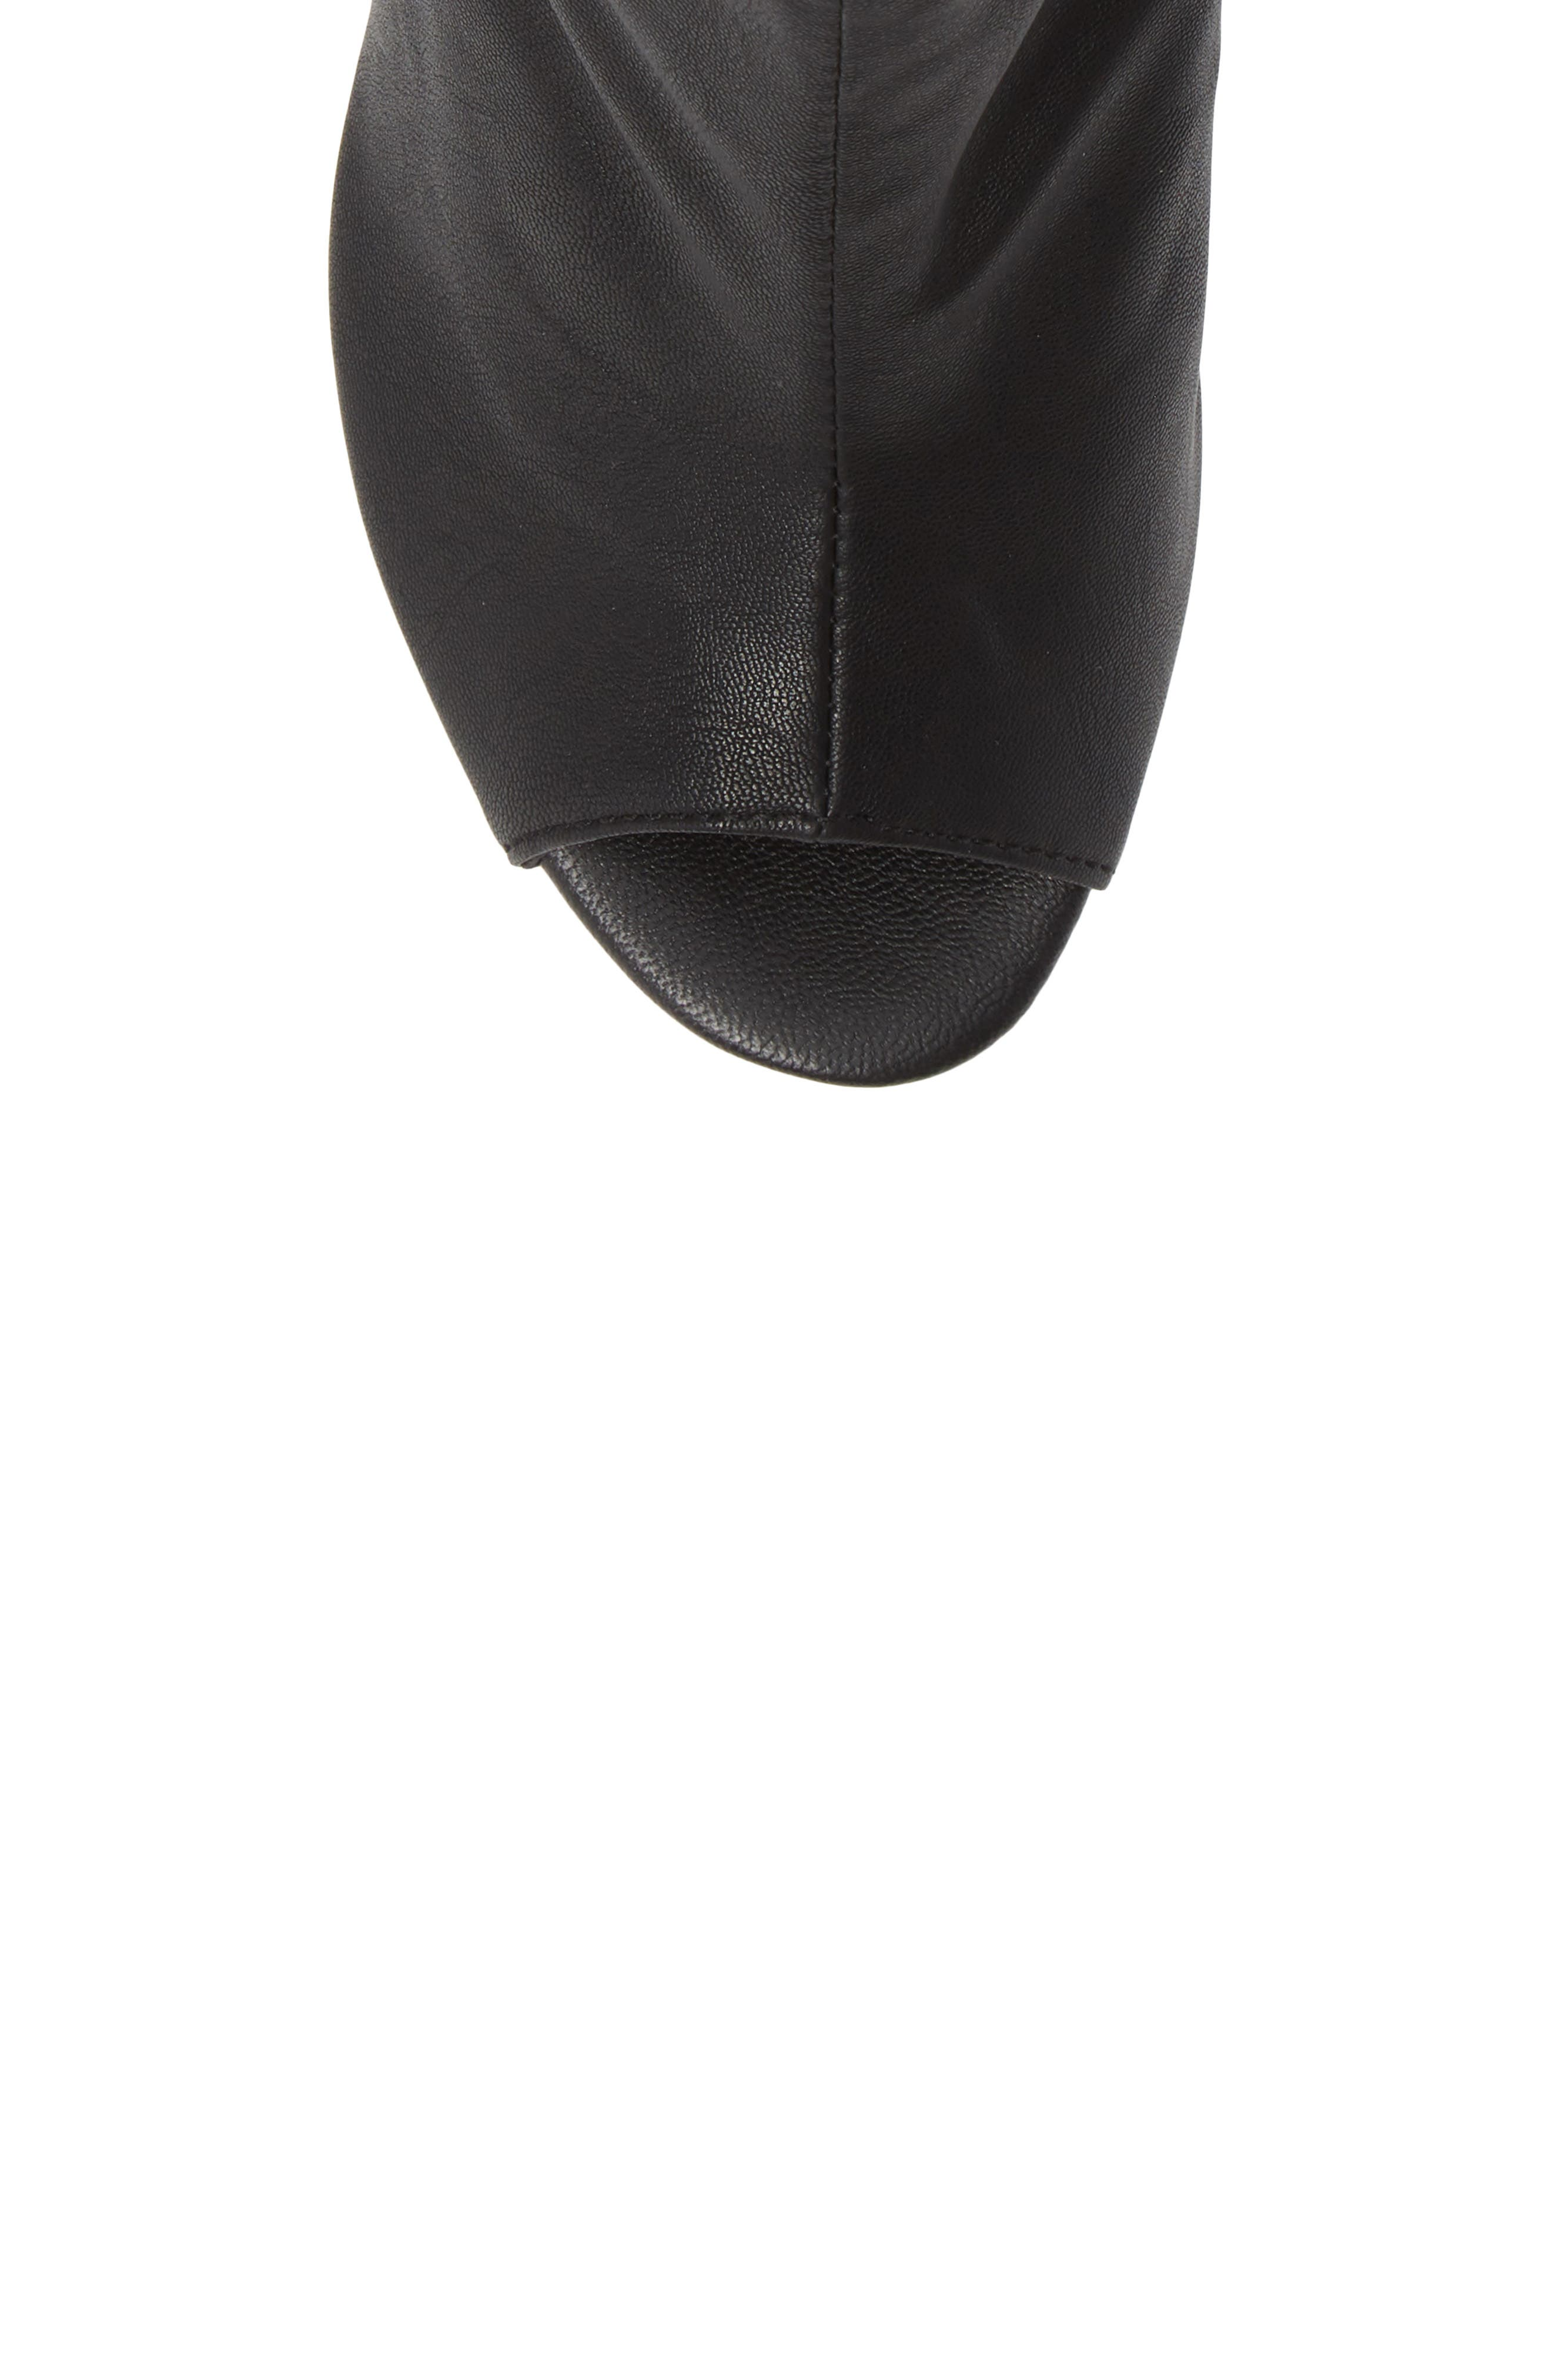 Tyra Peep Toe Platform Bootie,                             Alternate thumbnail 5, color,                             Black Fabric